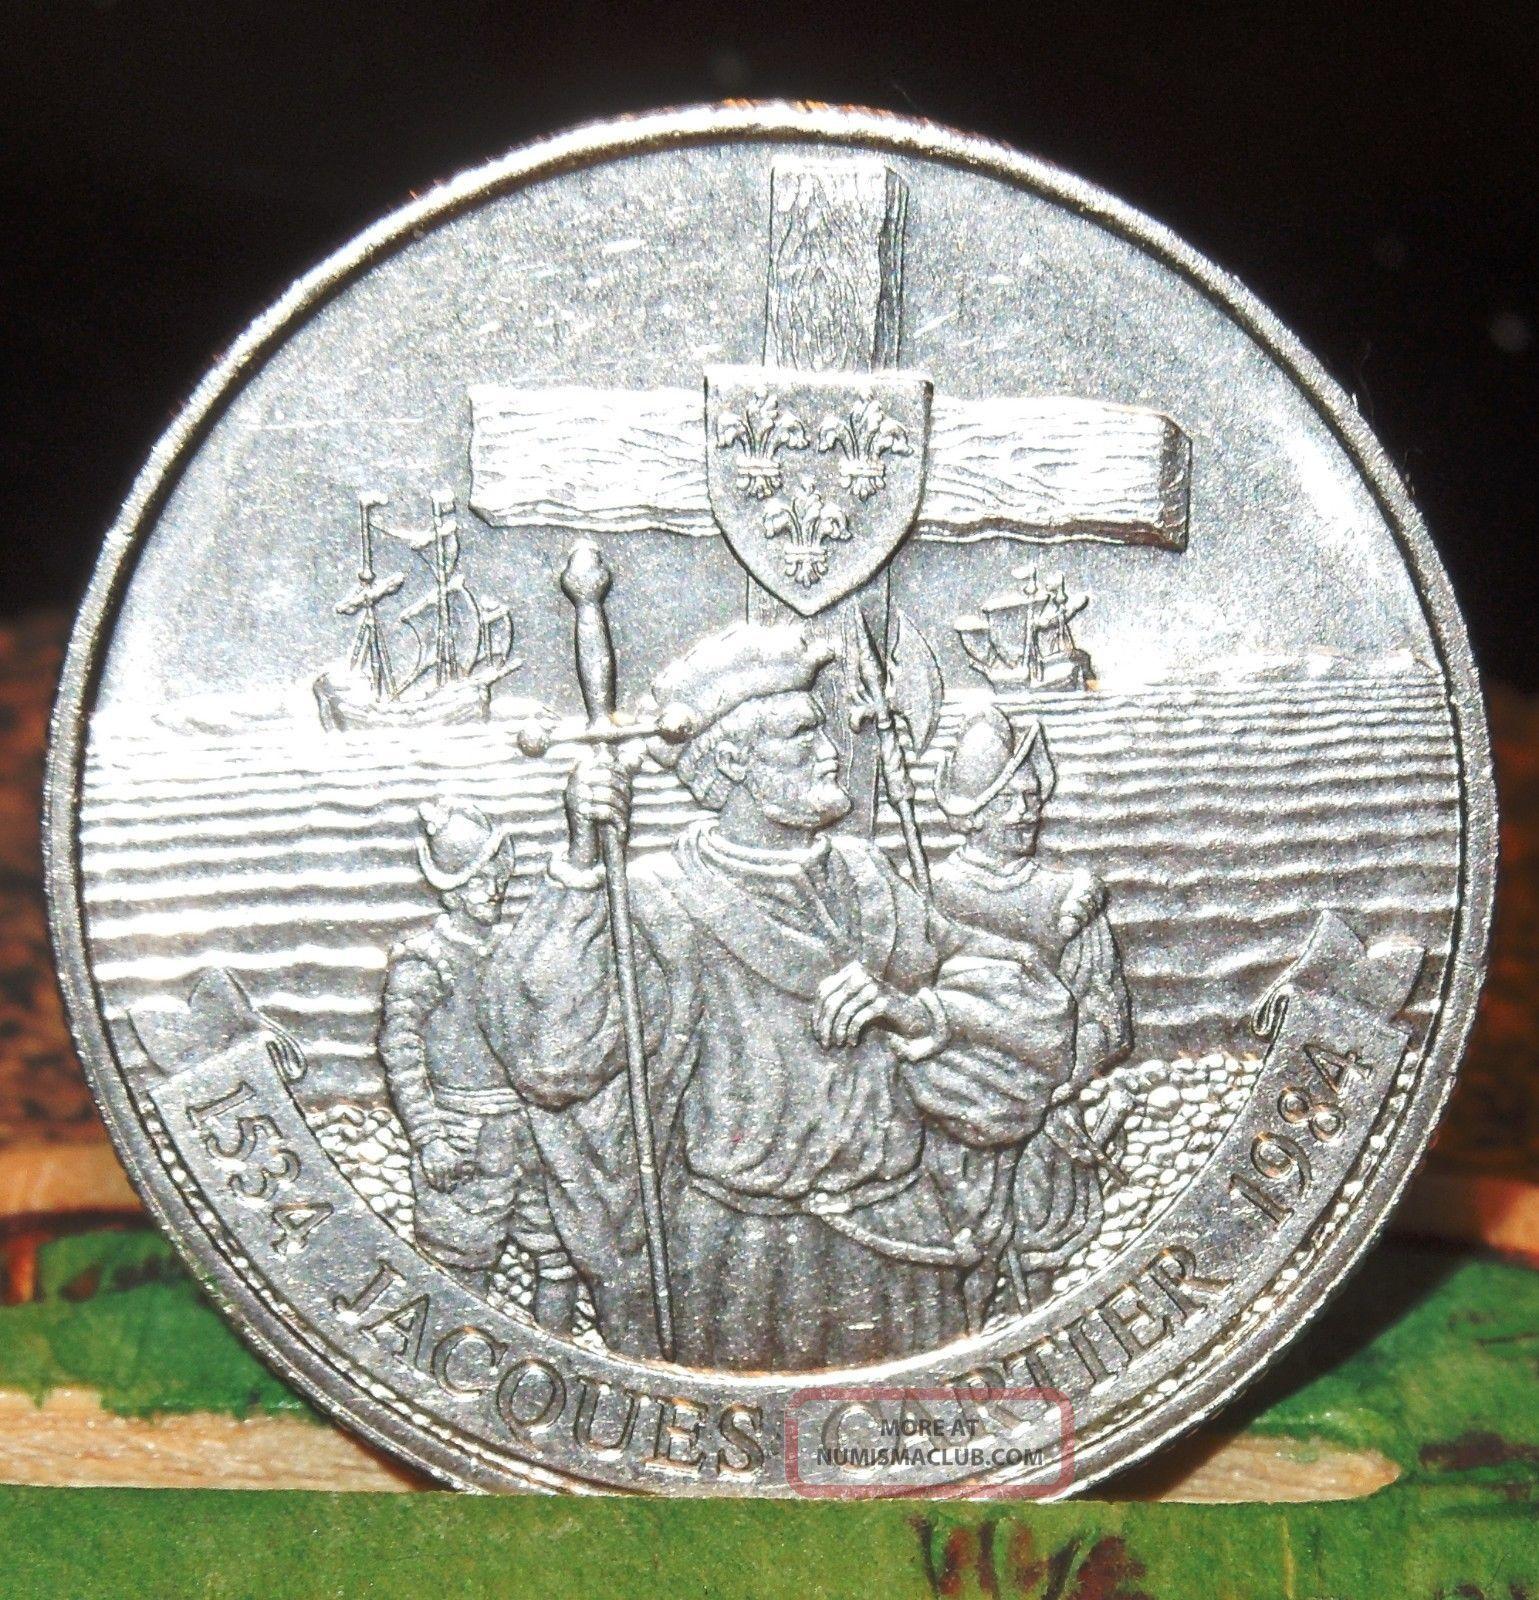 1984 Canada Jaques Cartier Dollar 1984 Canadian 1 Dollar